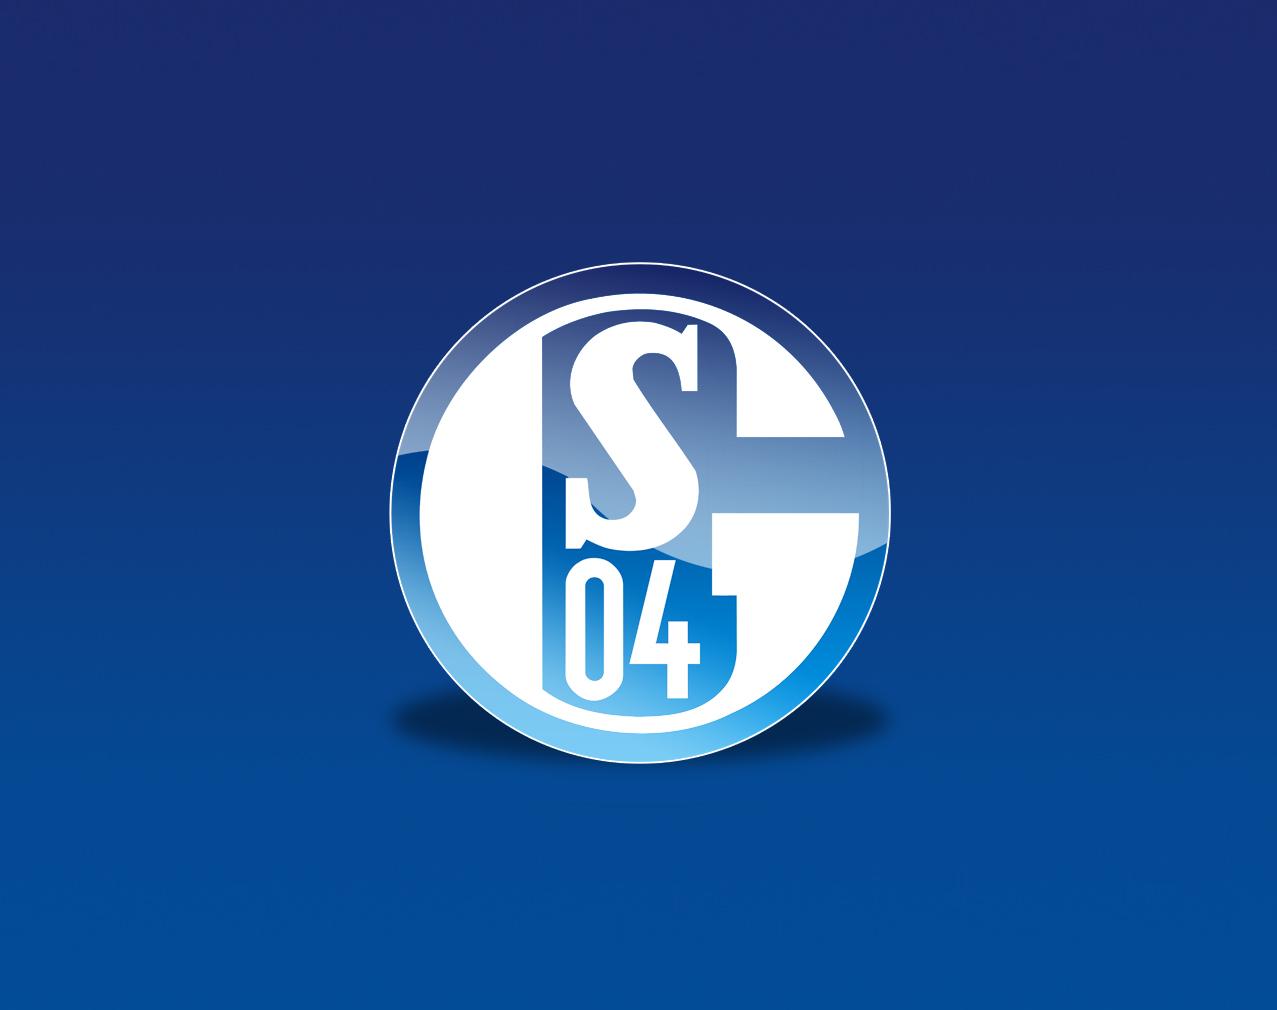 Schalke 04 Wallpaper HD Wallpaper free download, Rug